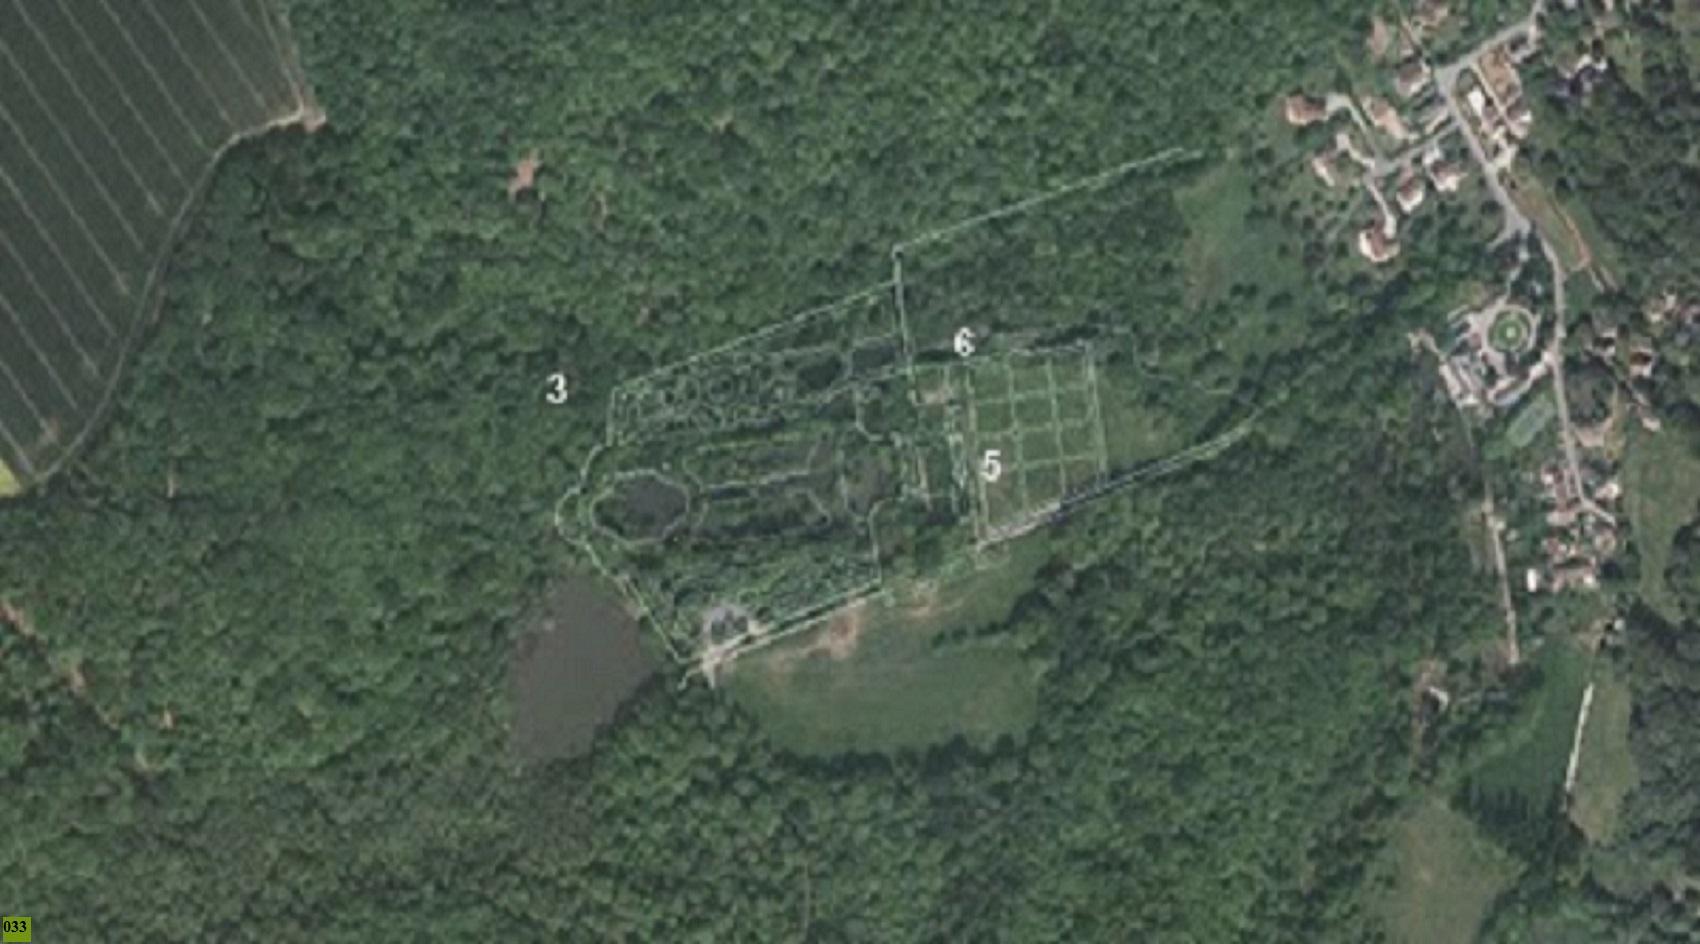 04 superposition plan abbaye sur vue aerienne du site